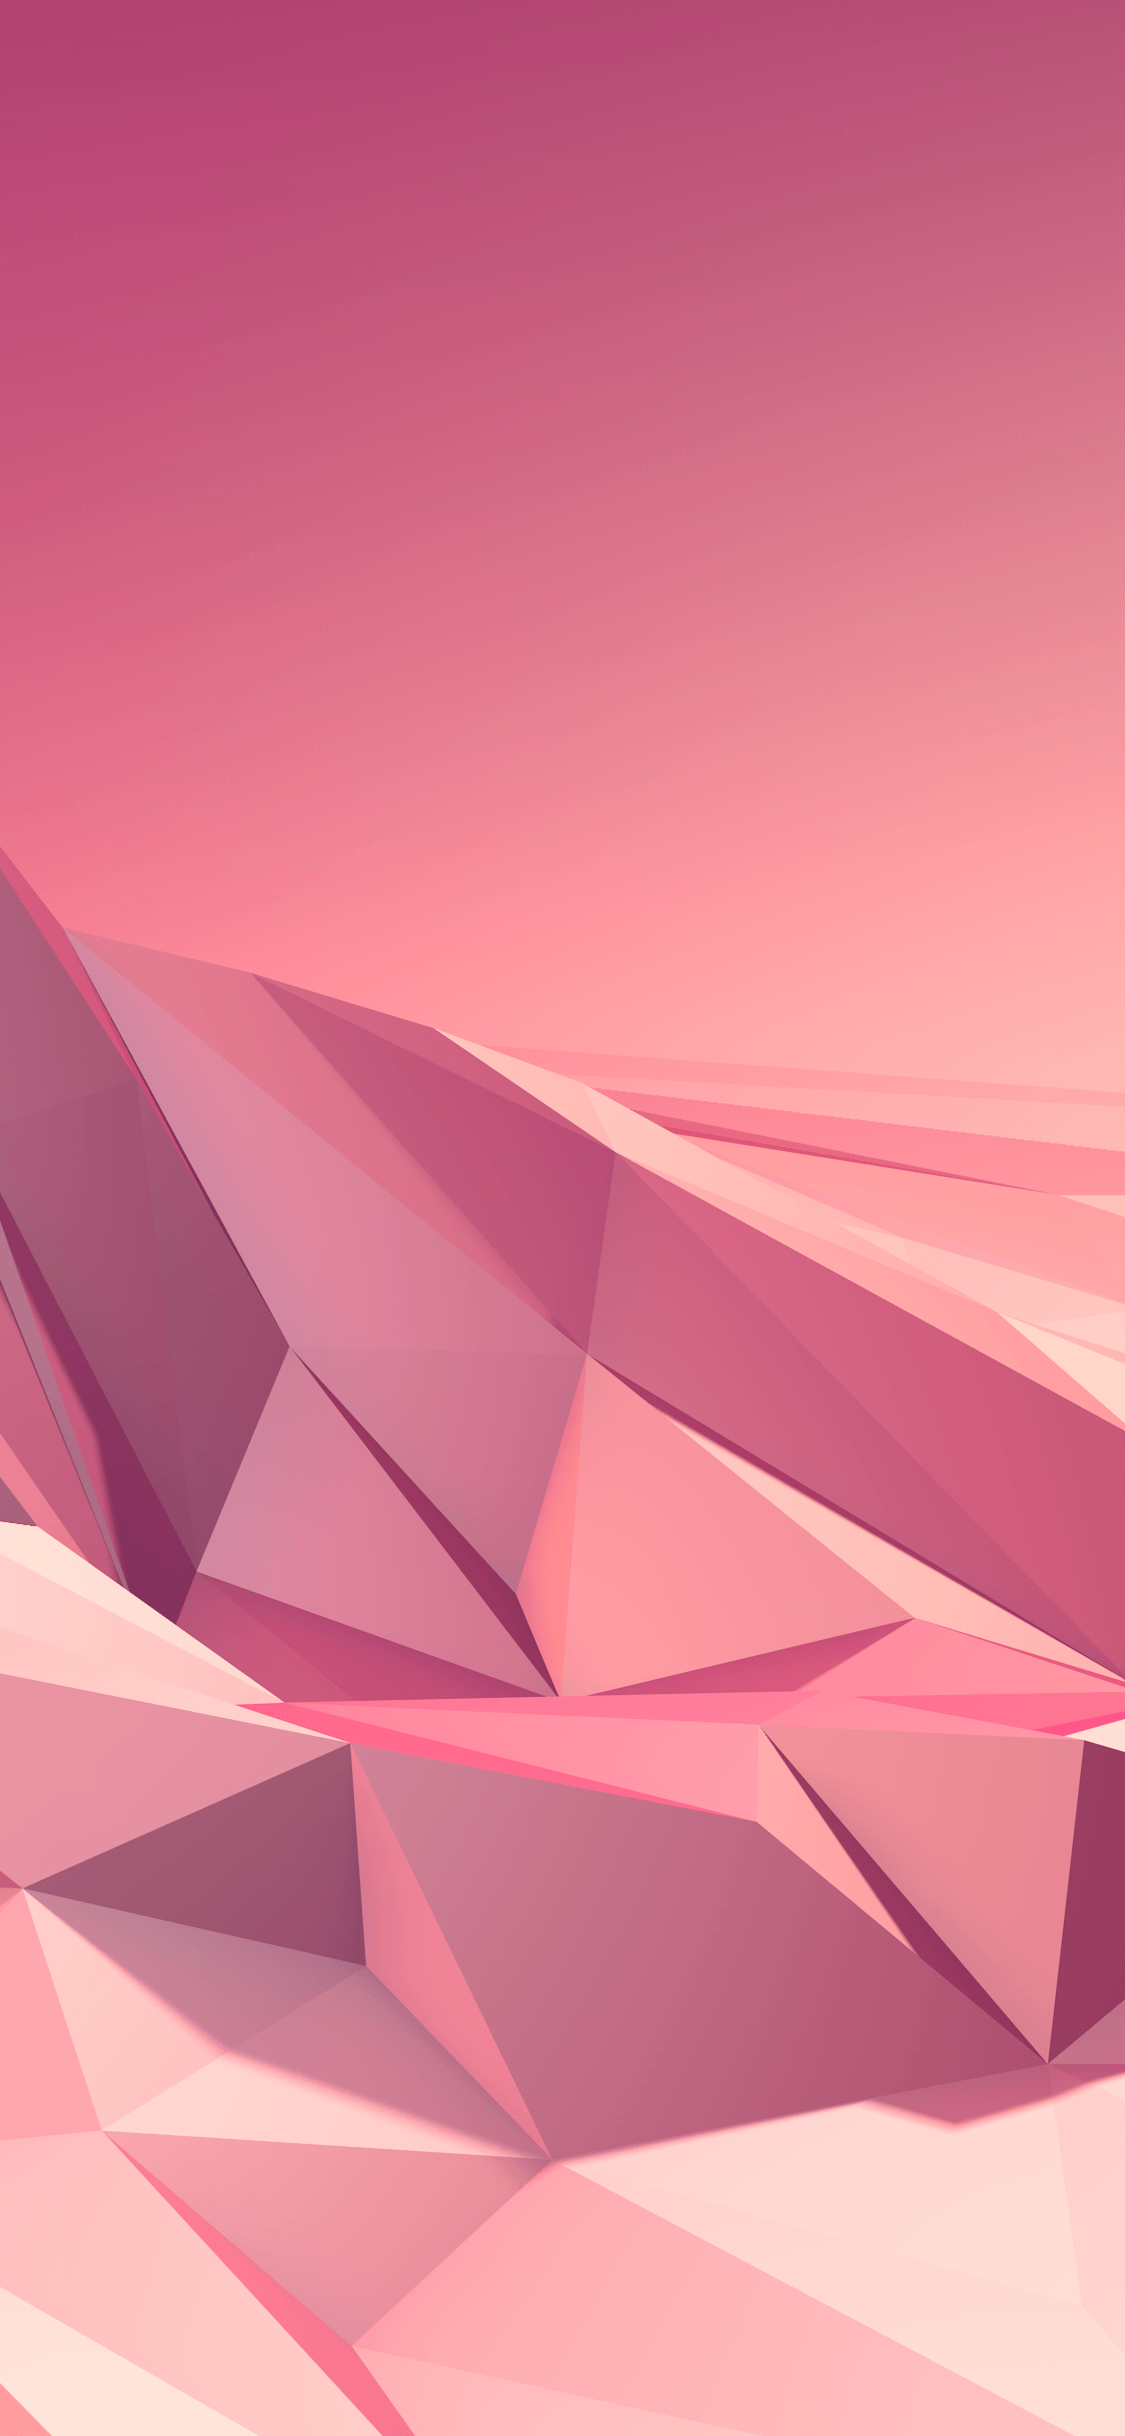 Iphone X Wallpaper Tumblr Pink